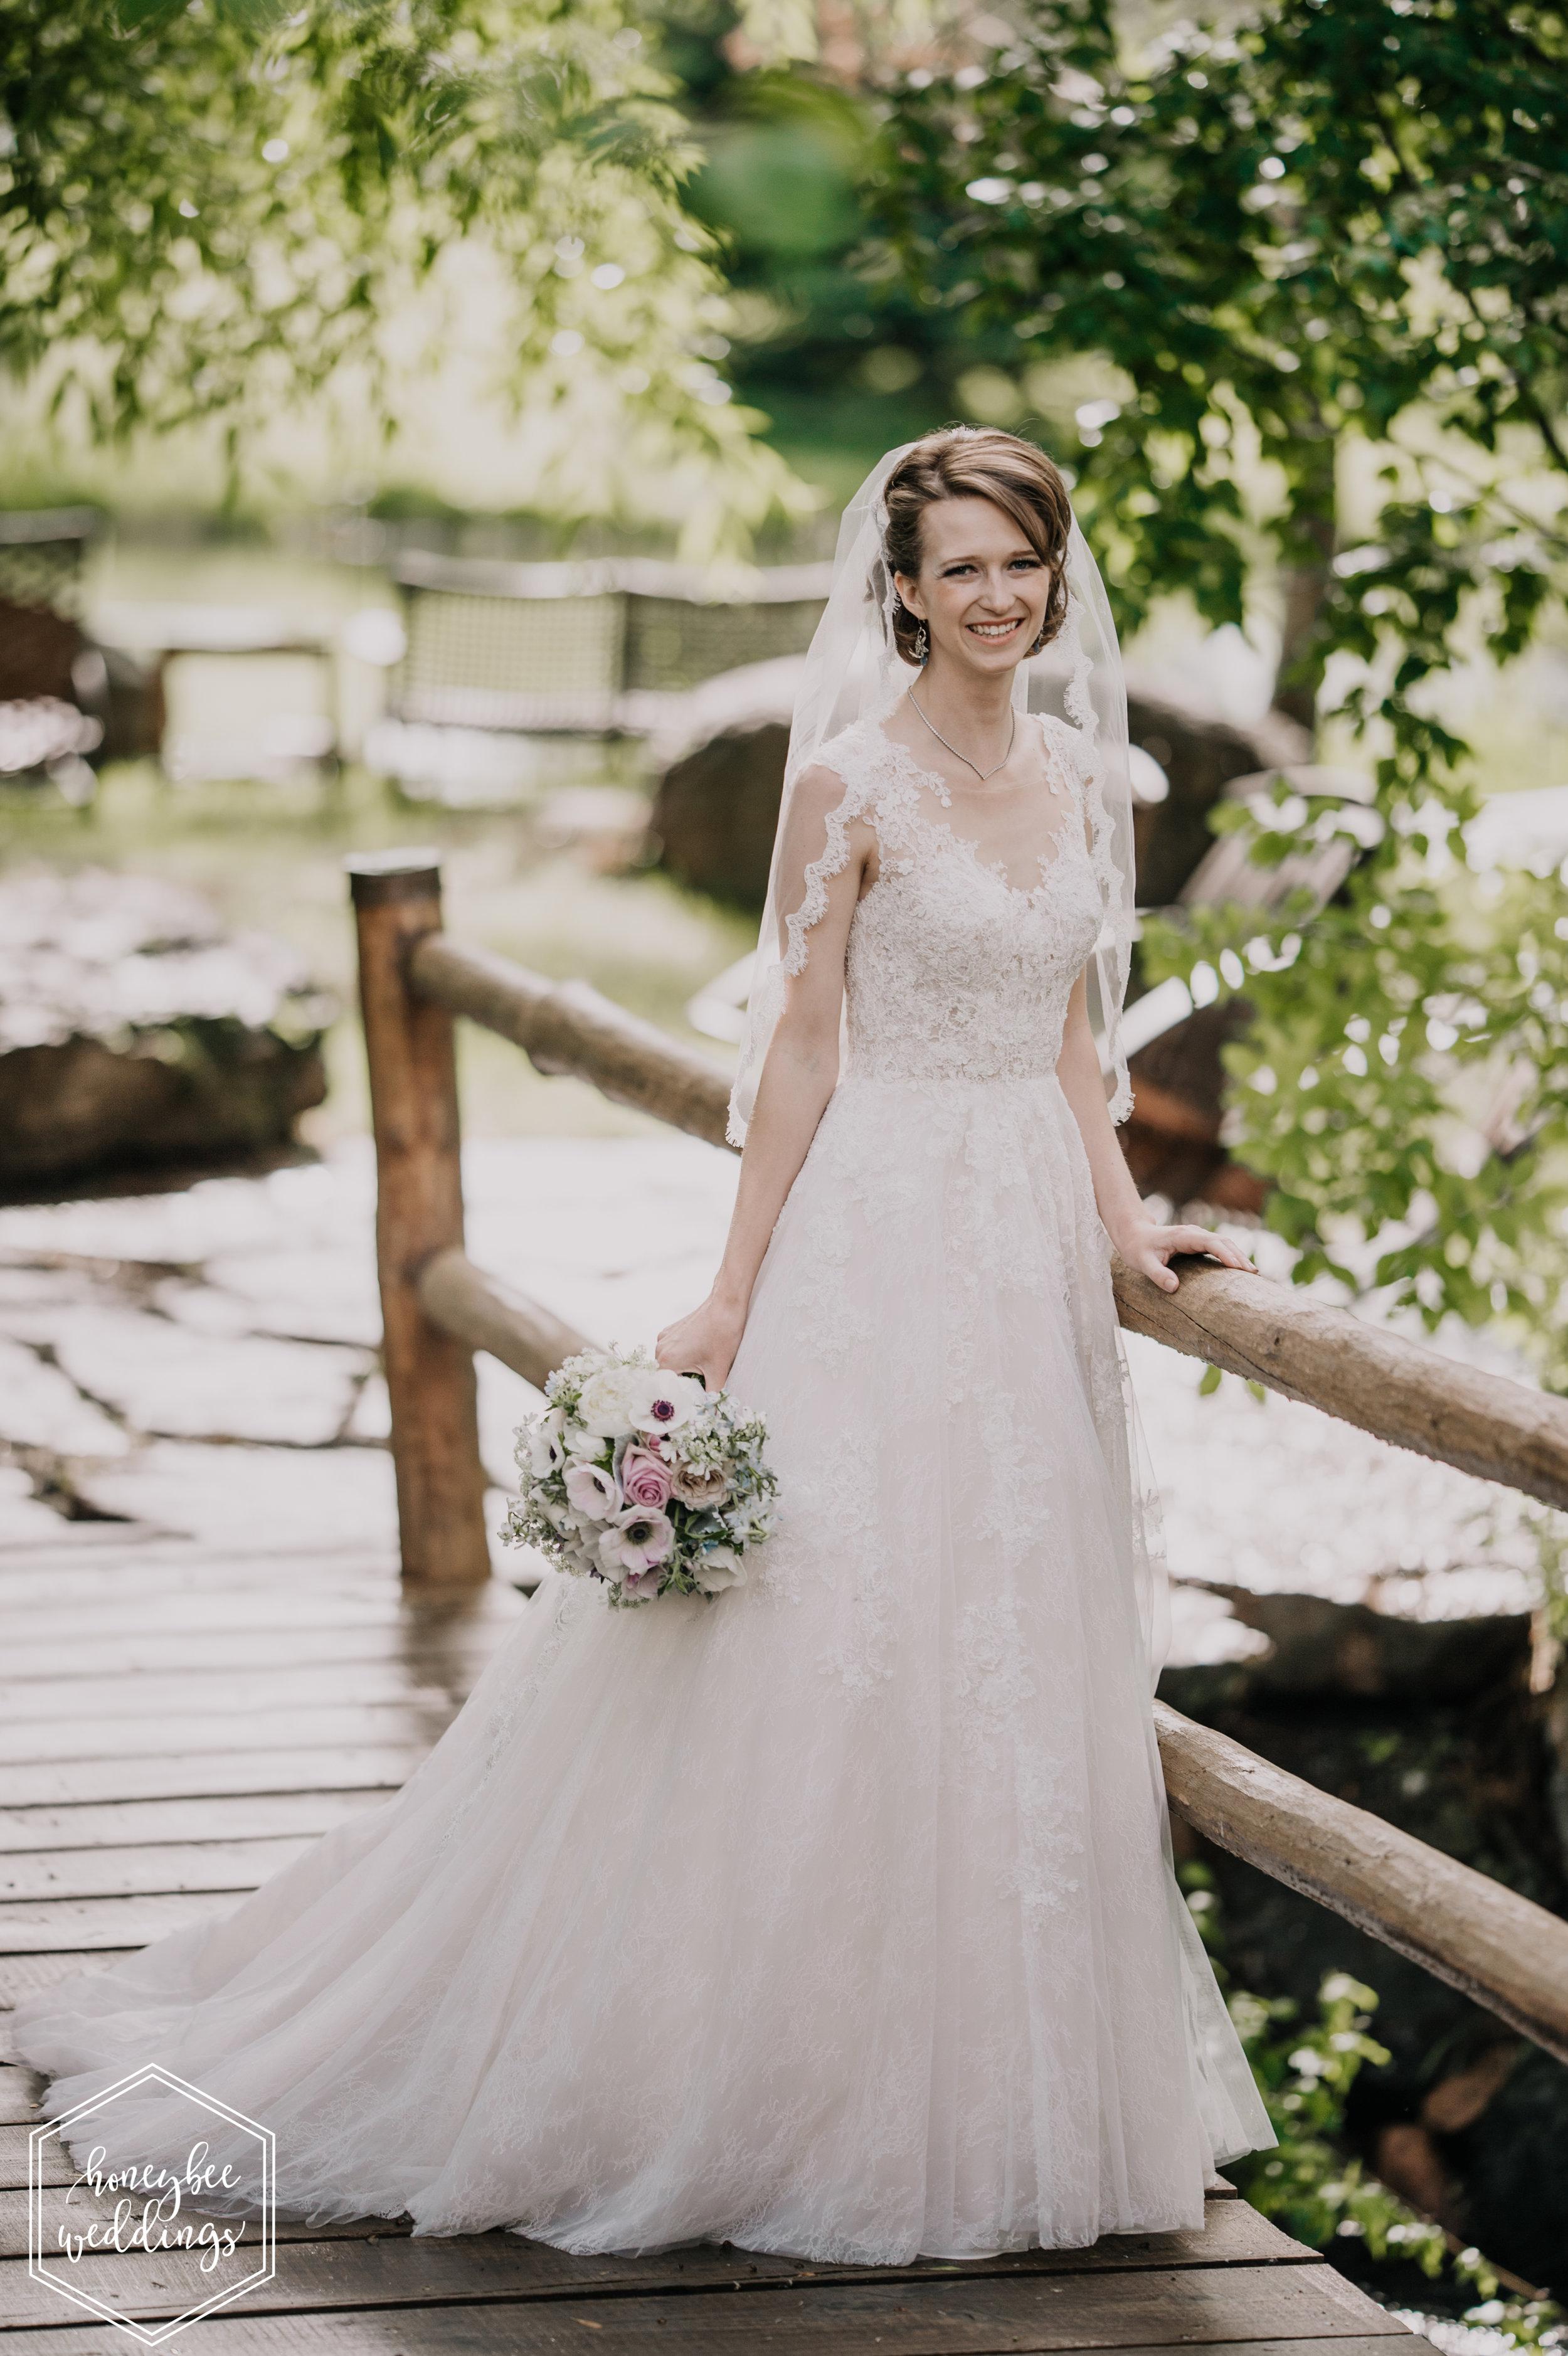 282 Riverside Country Club Wedding_Montana Wedding Photographer_Lauren Jackson + Evan Ivaldi 2018-6441.jpg